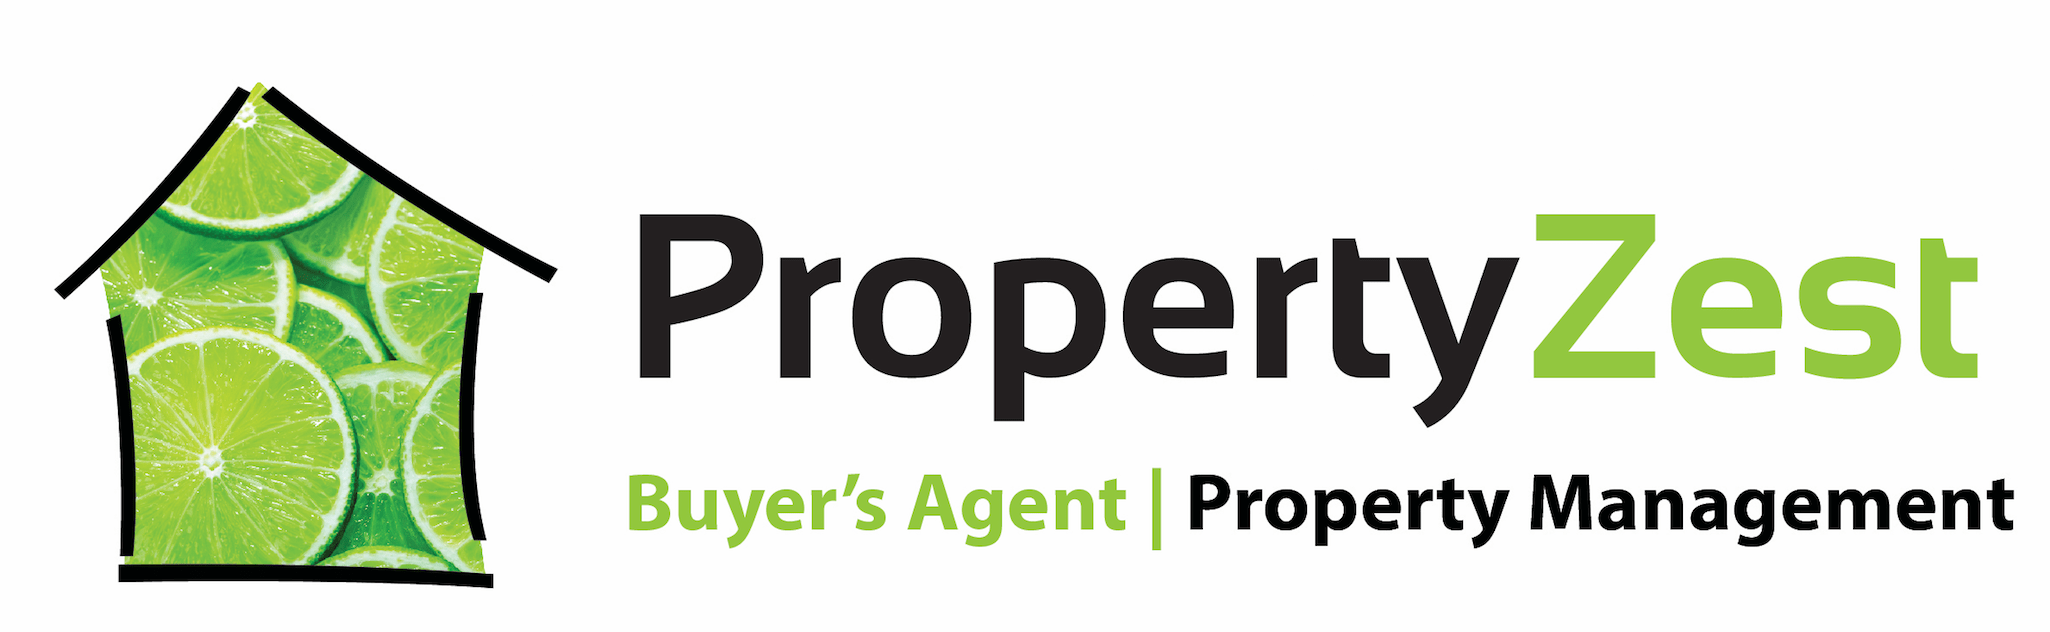 Property Zest